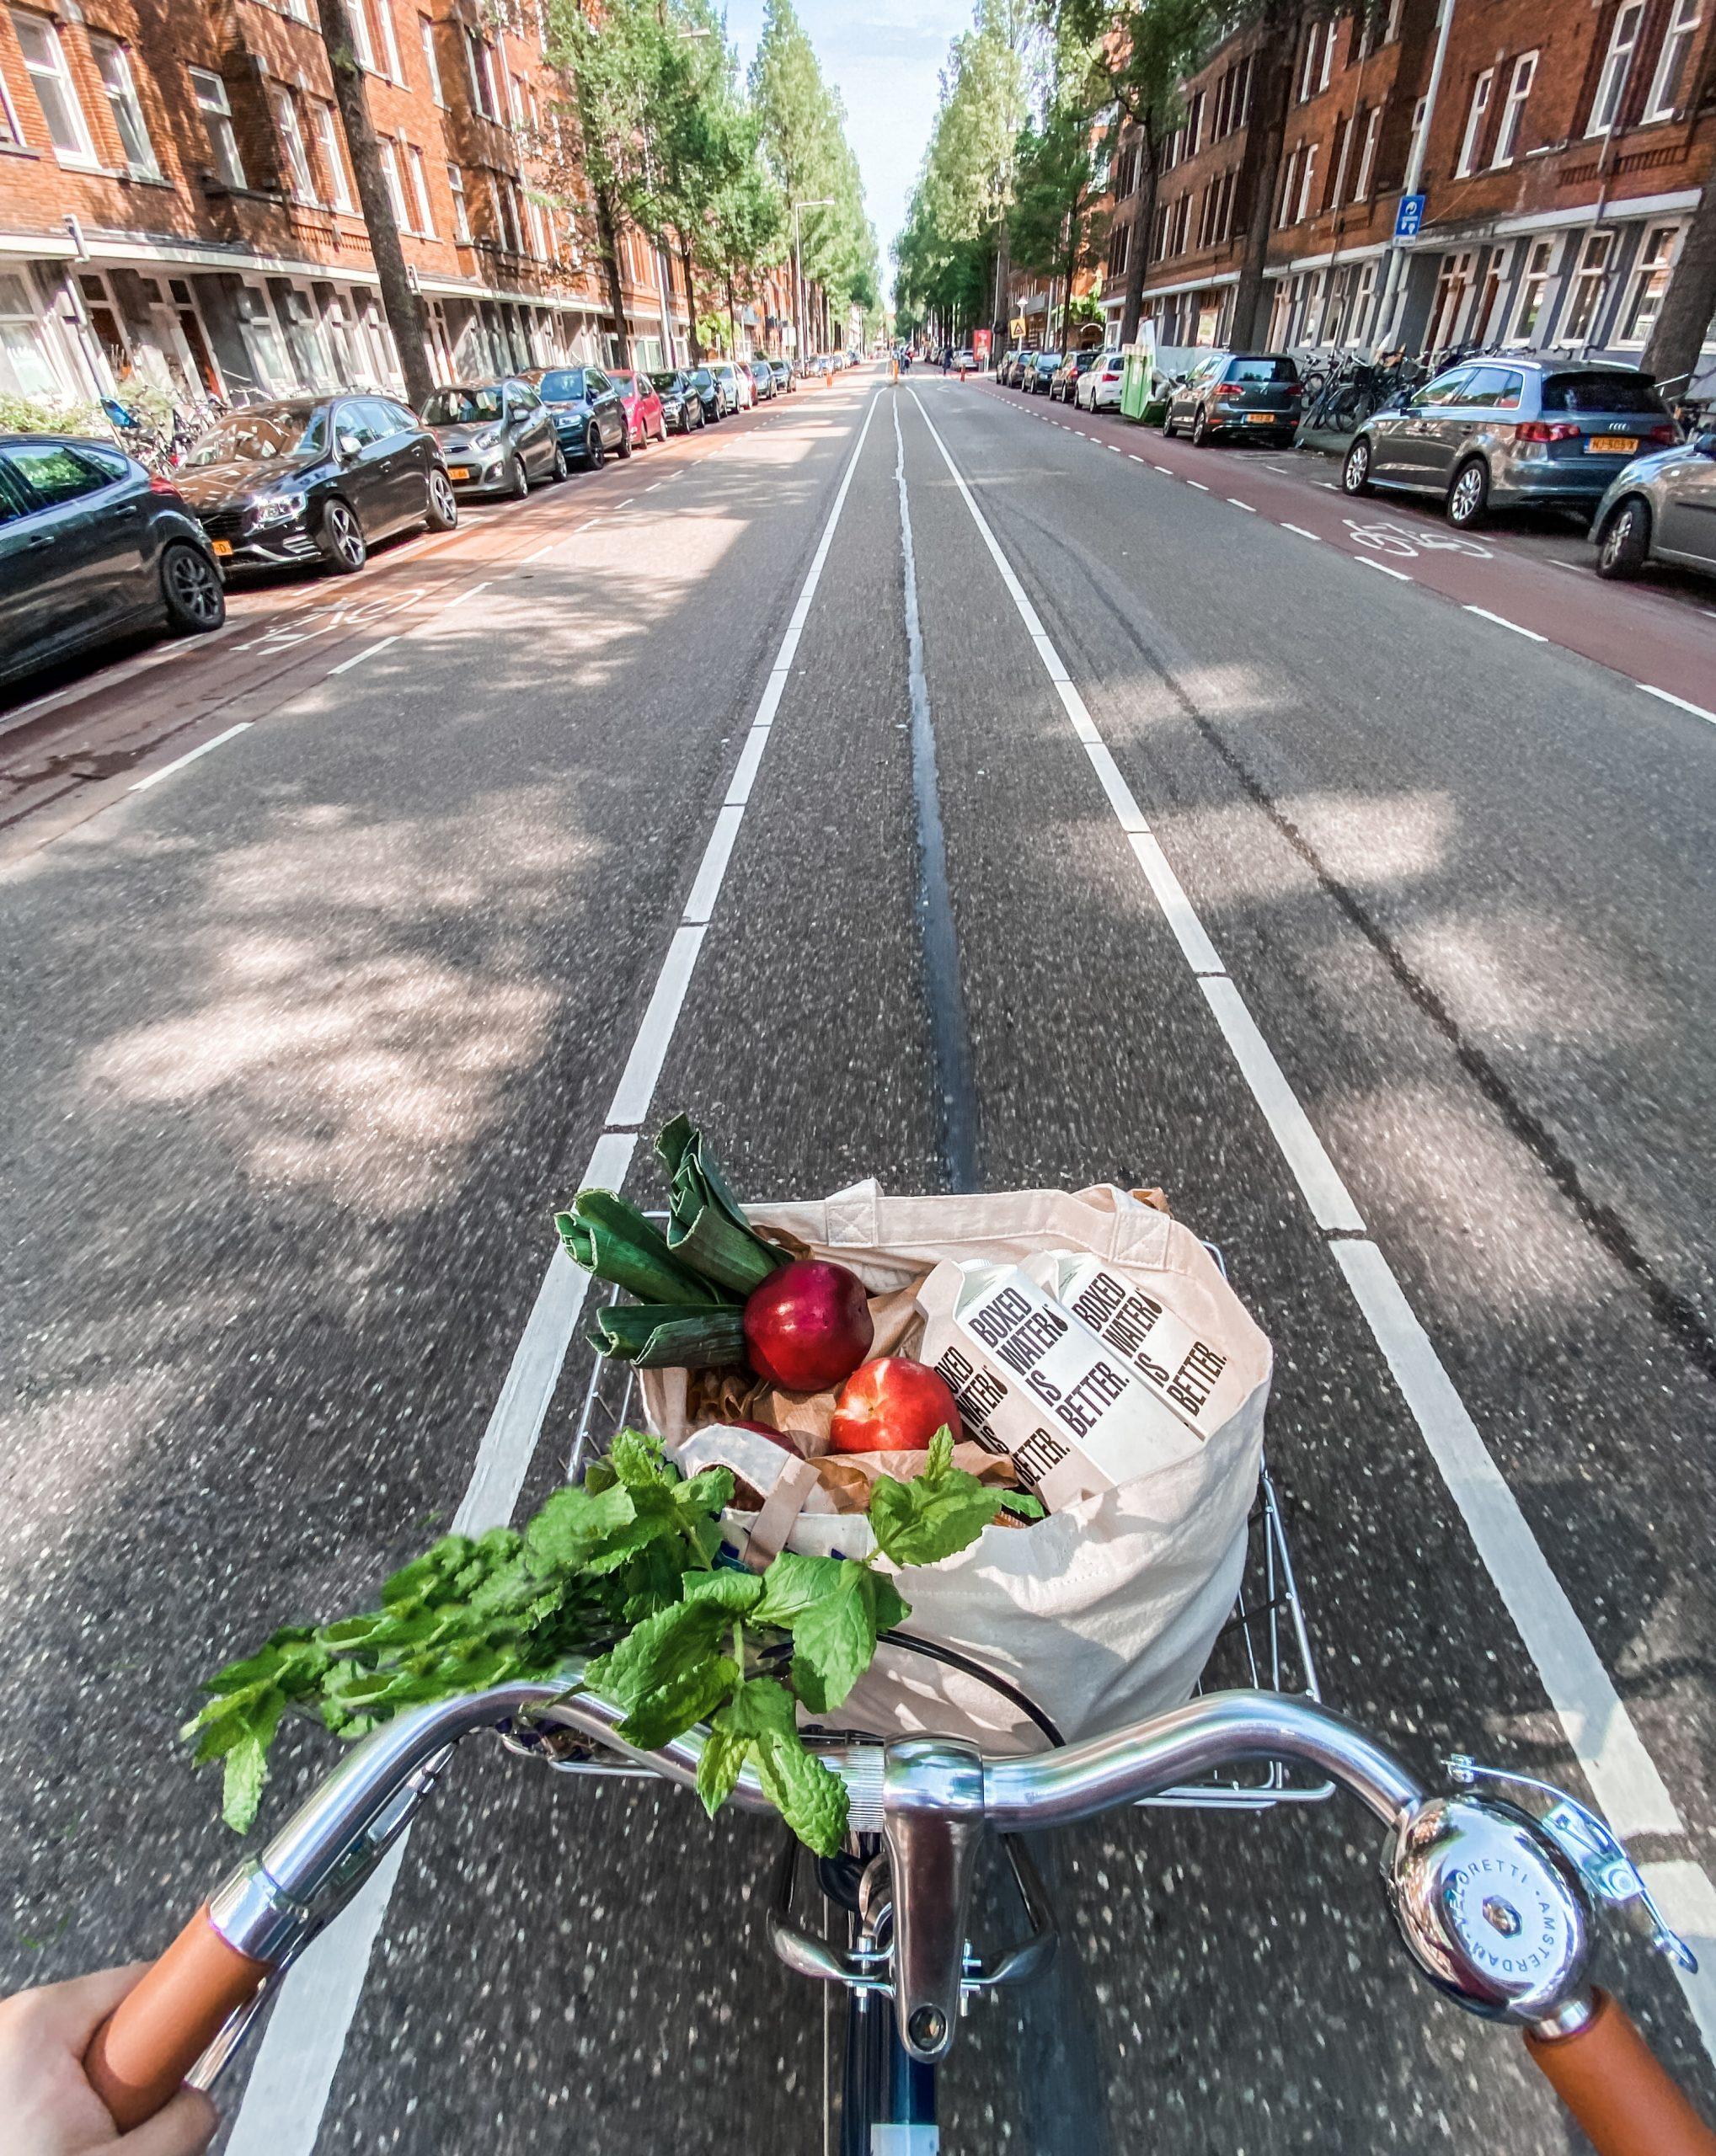 food in a bike basket